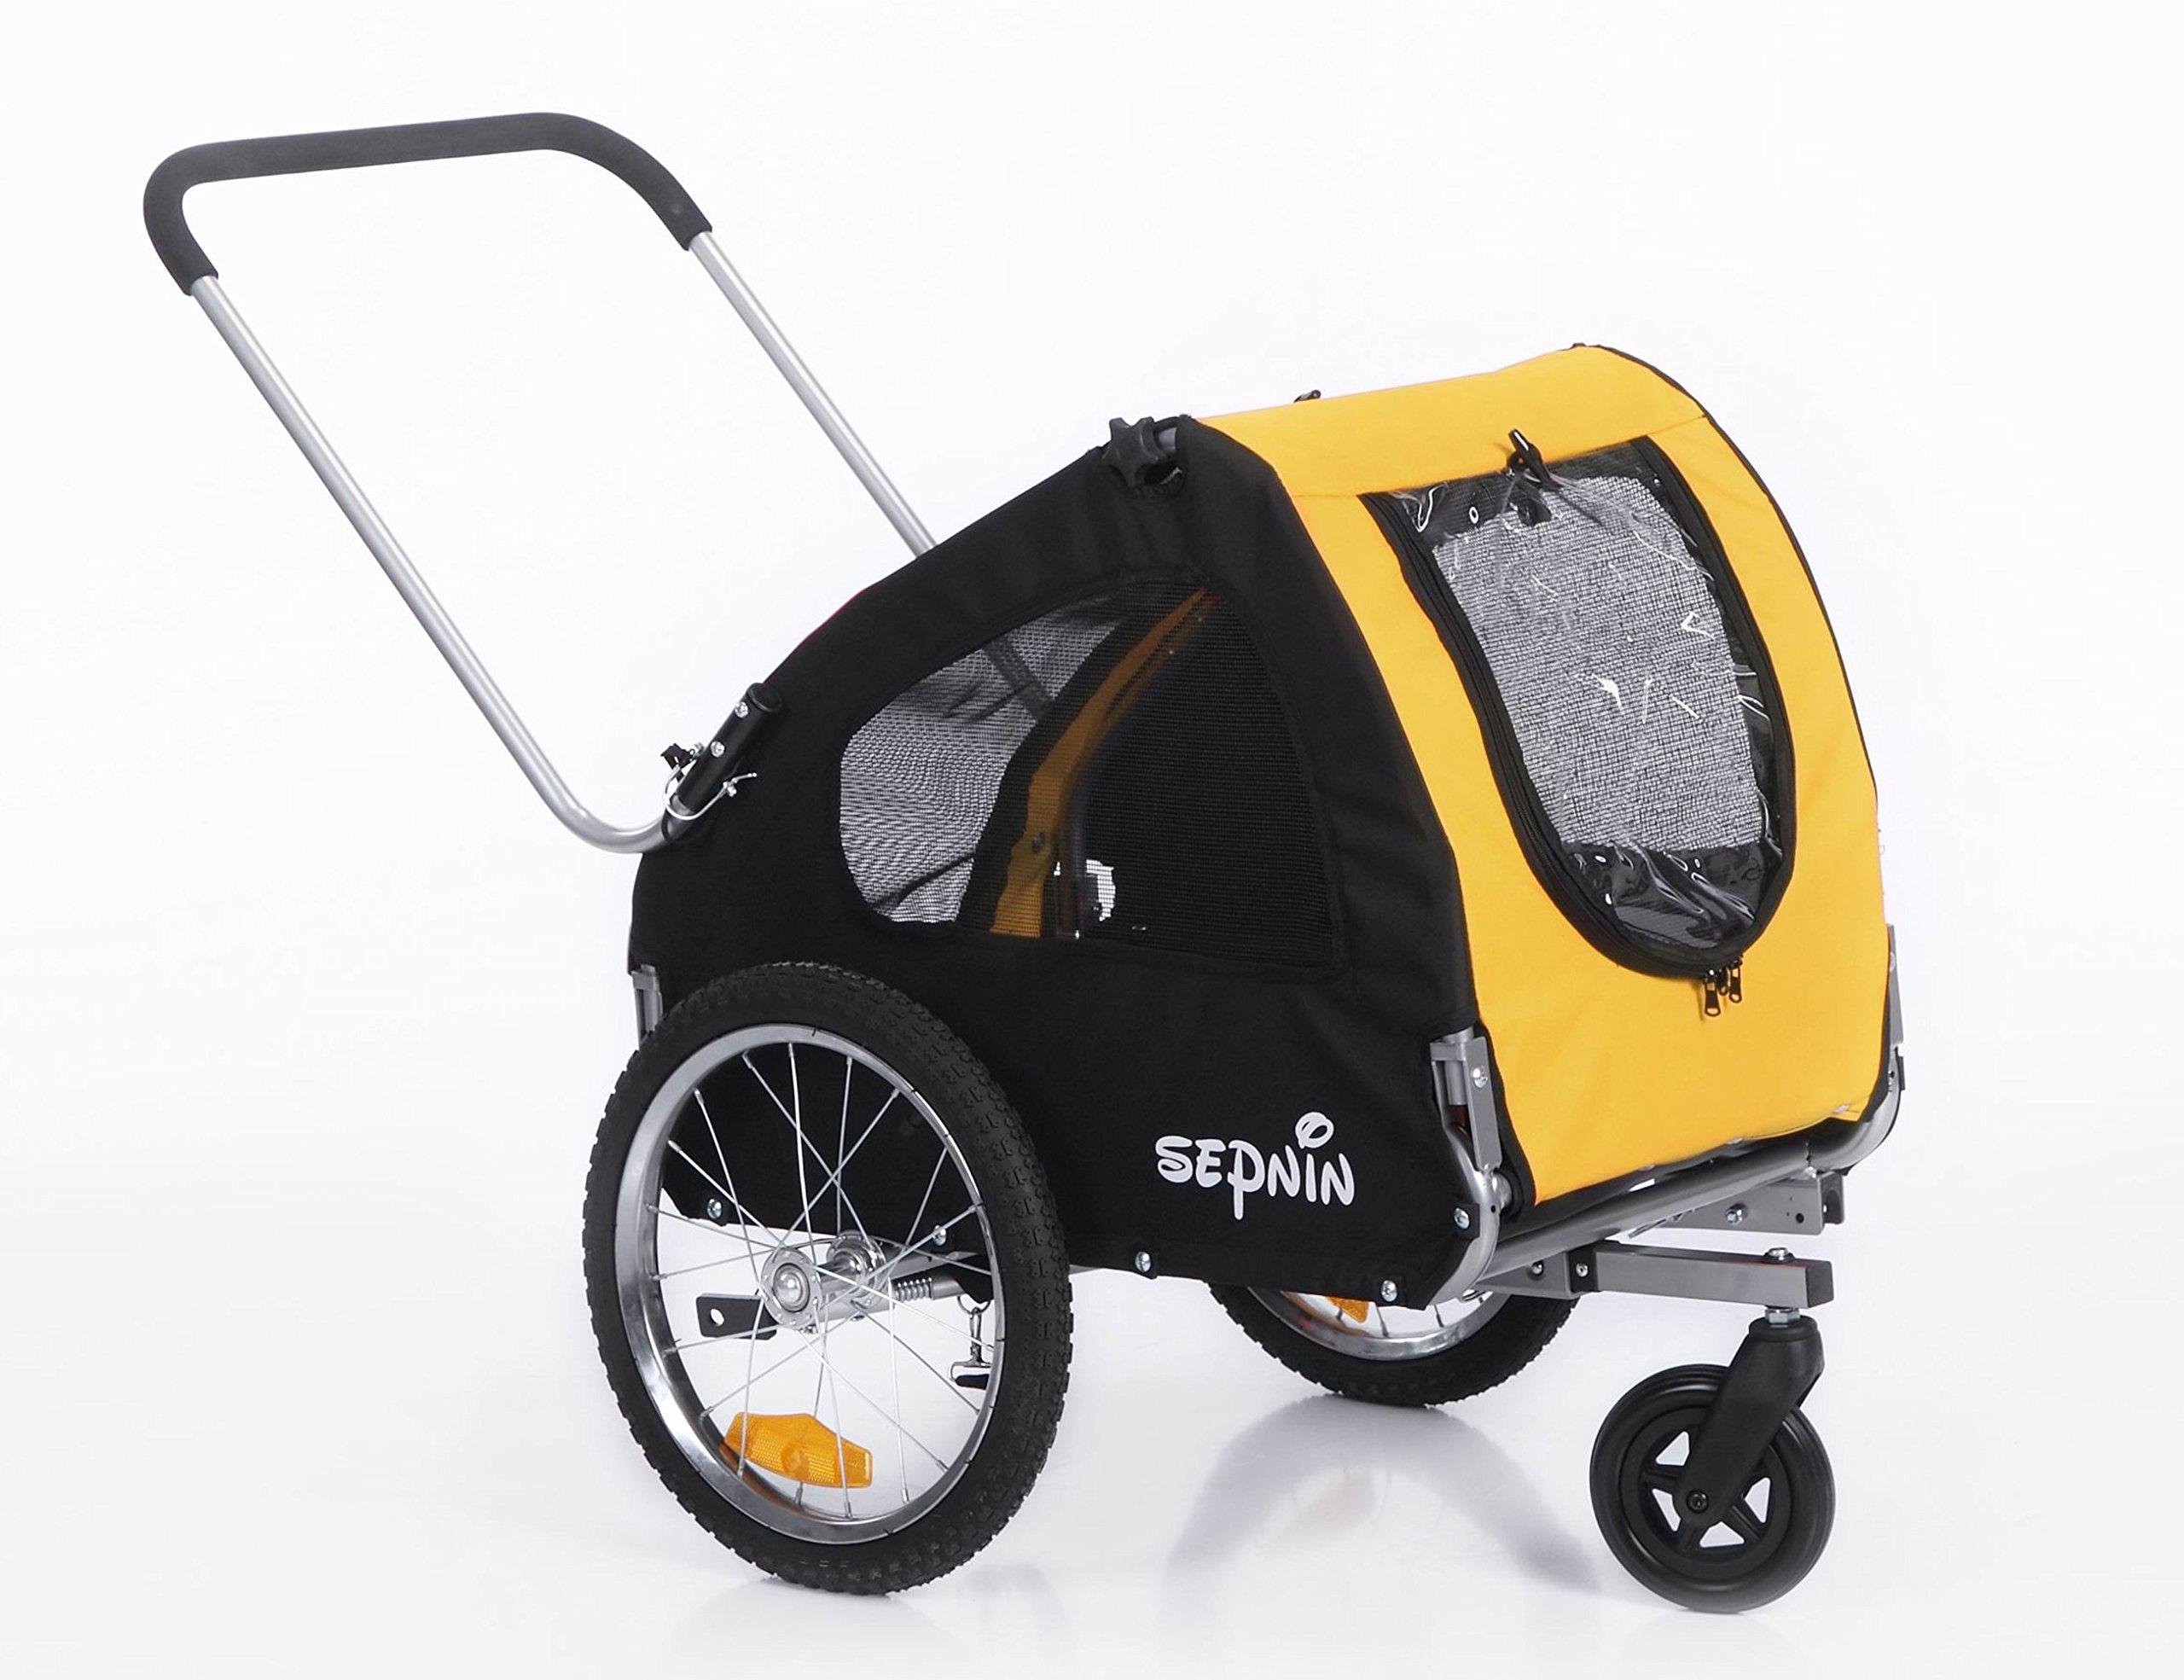 Sepnine 2 in 1 Pet Dog Bicycle/Bike Carrier/Trailer/Jogger 10305 (Yellow/Black)